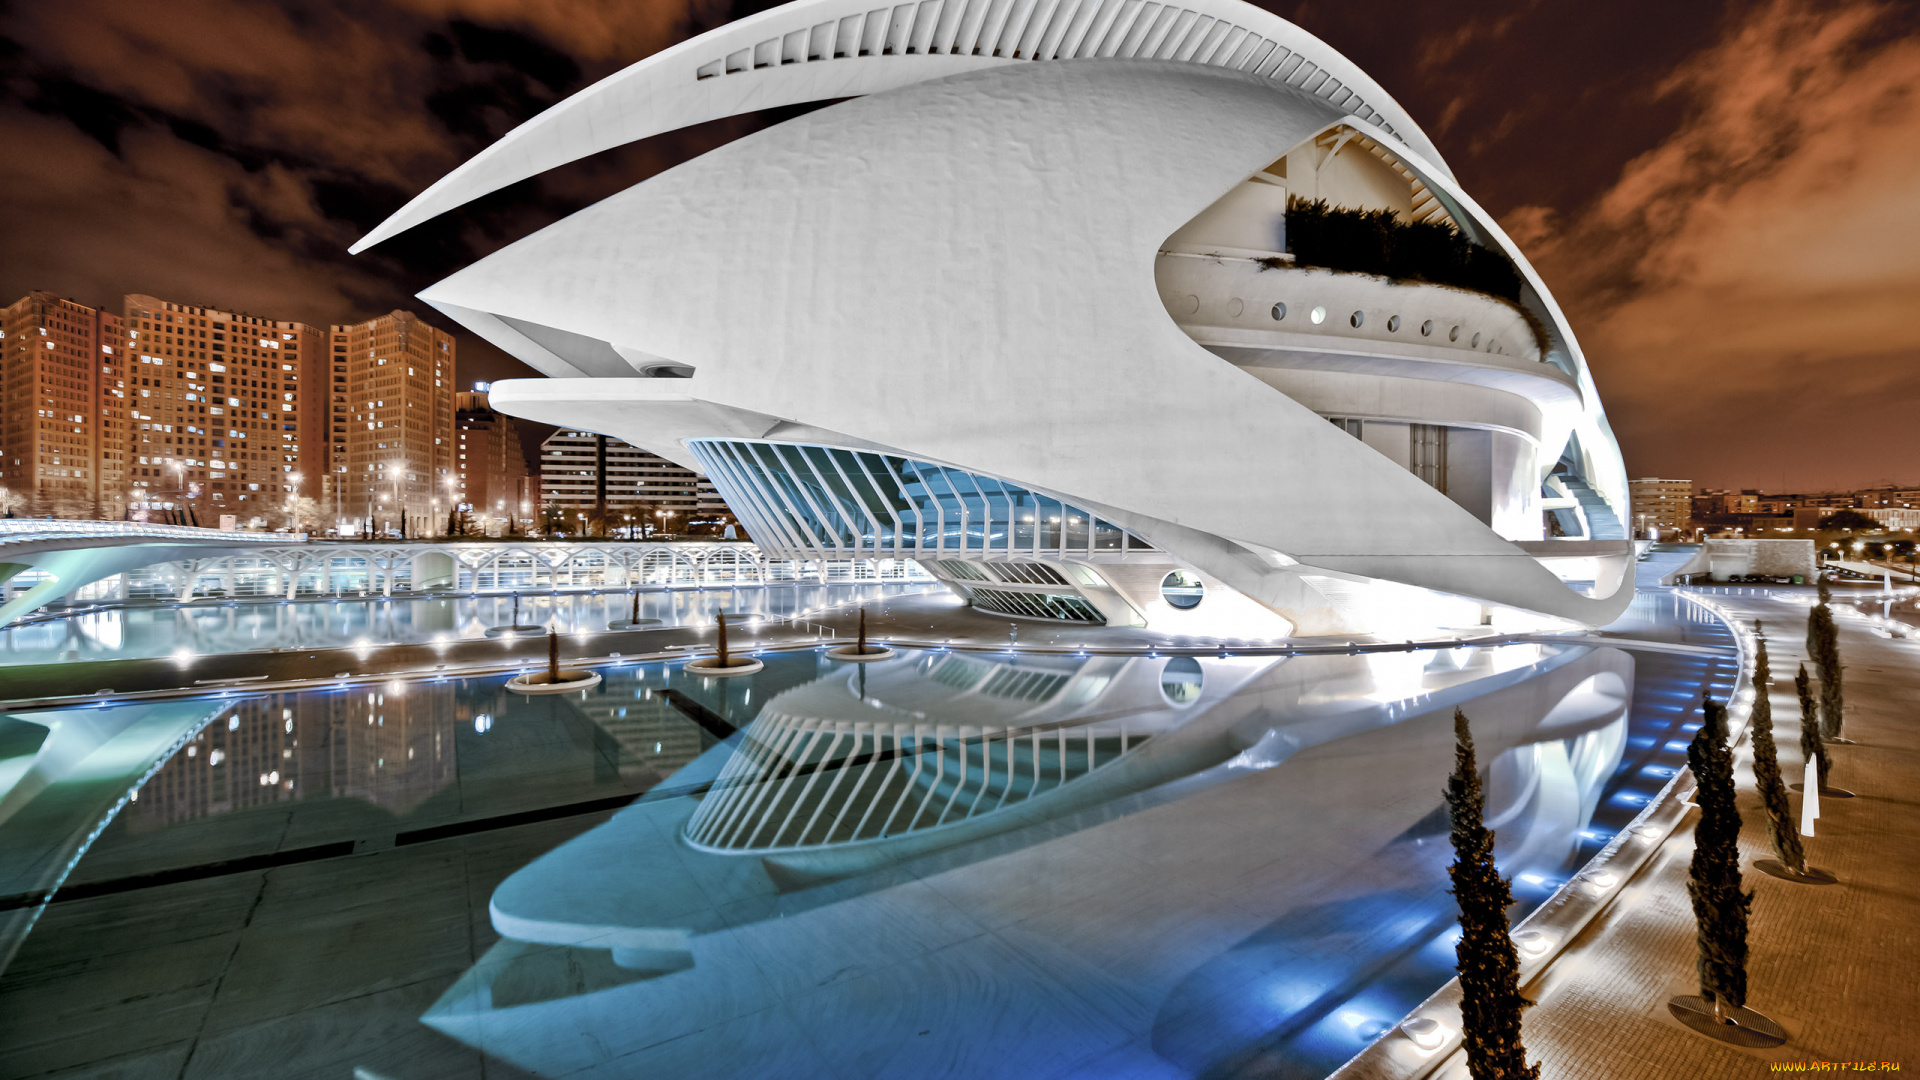 City of Arts and Sciences, Valencia, Spain в хорошем качестве